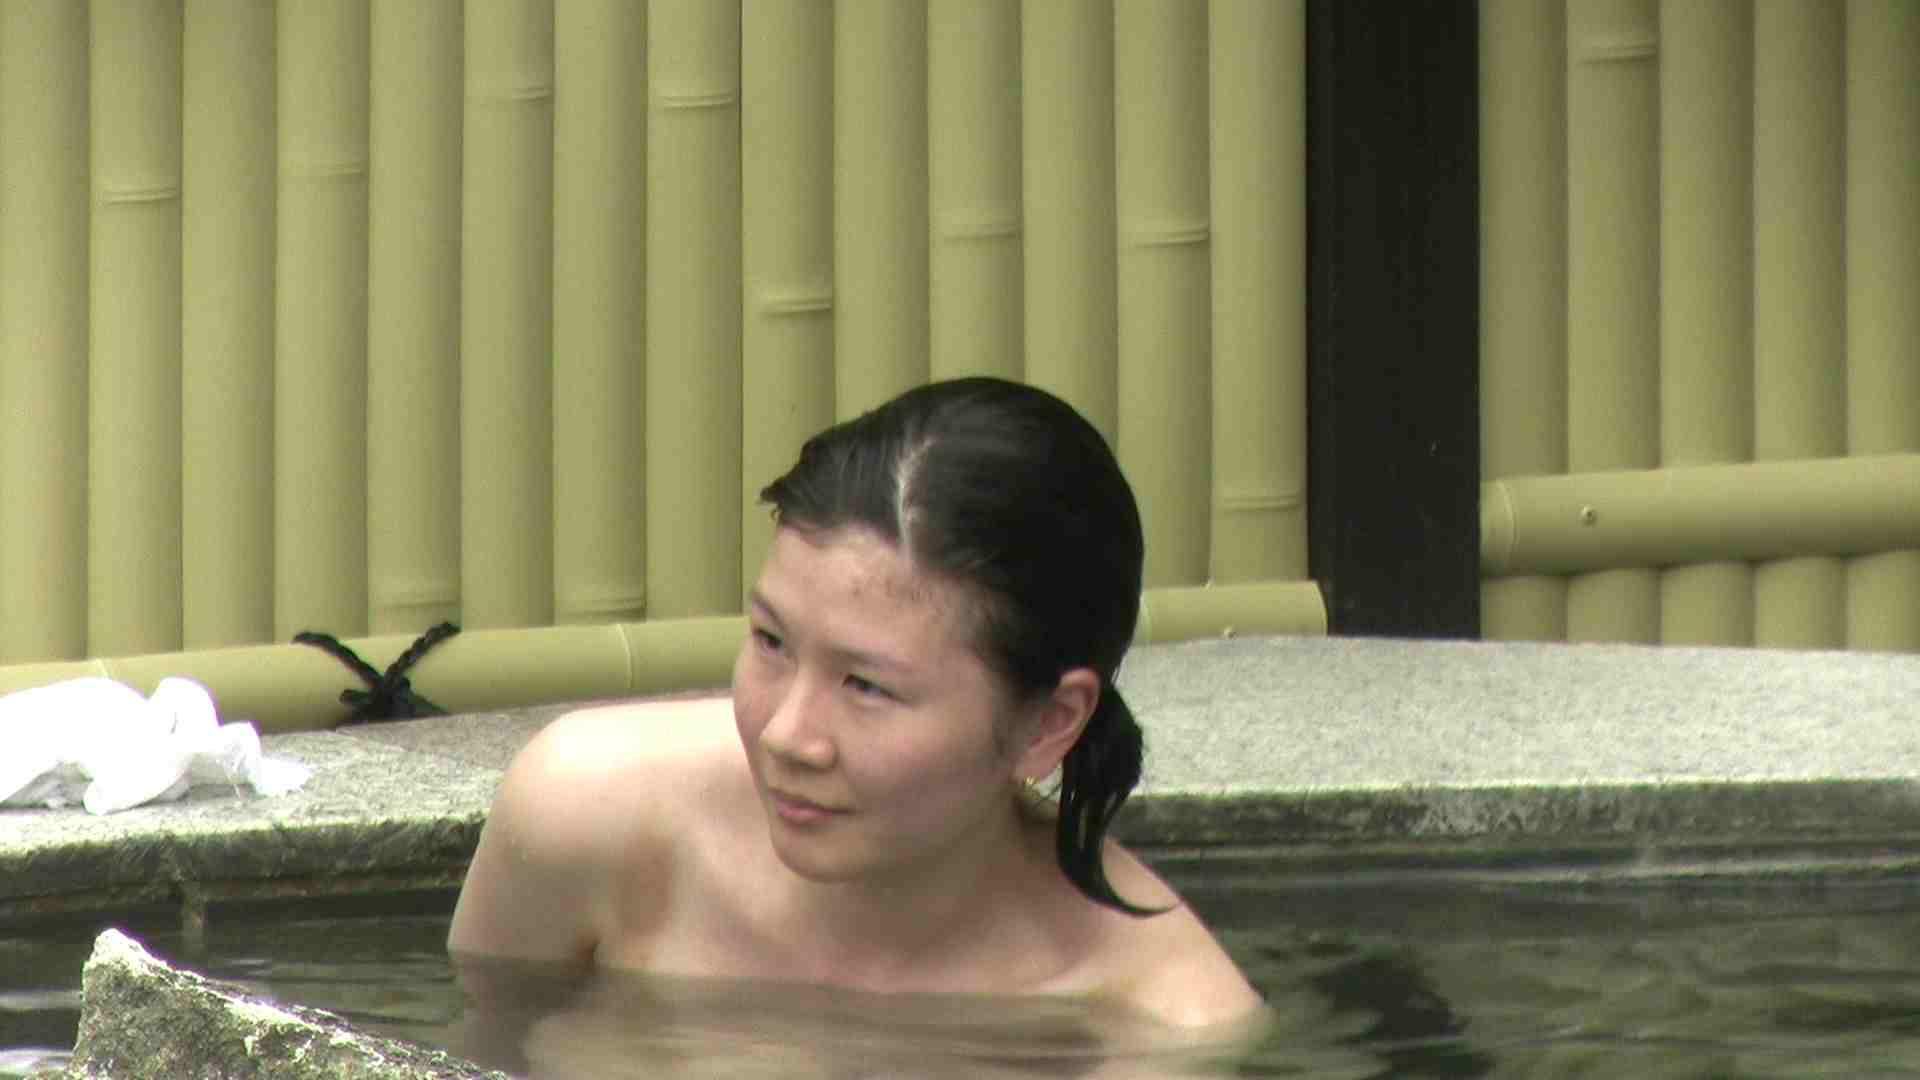 Aquaな露天風呂Vol.187 盗撮映像  99Pix 52